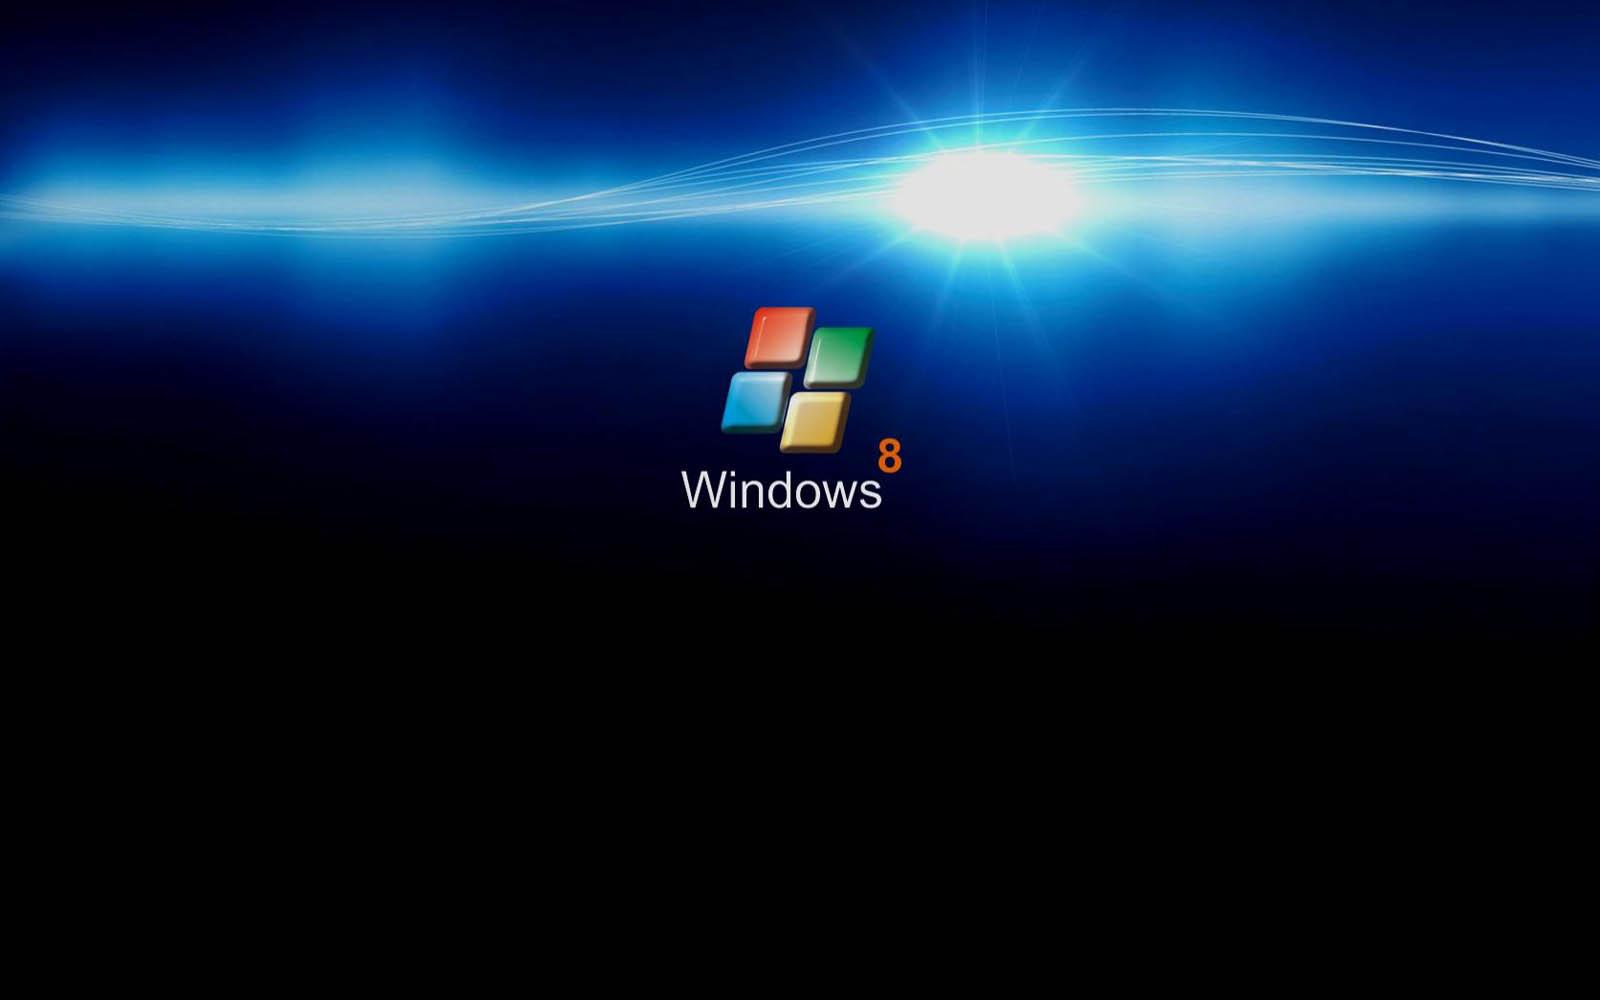 wallpaper Windows 8 Desktop Wallpapers and Backgrounds 1600x1000